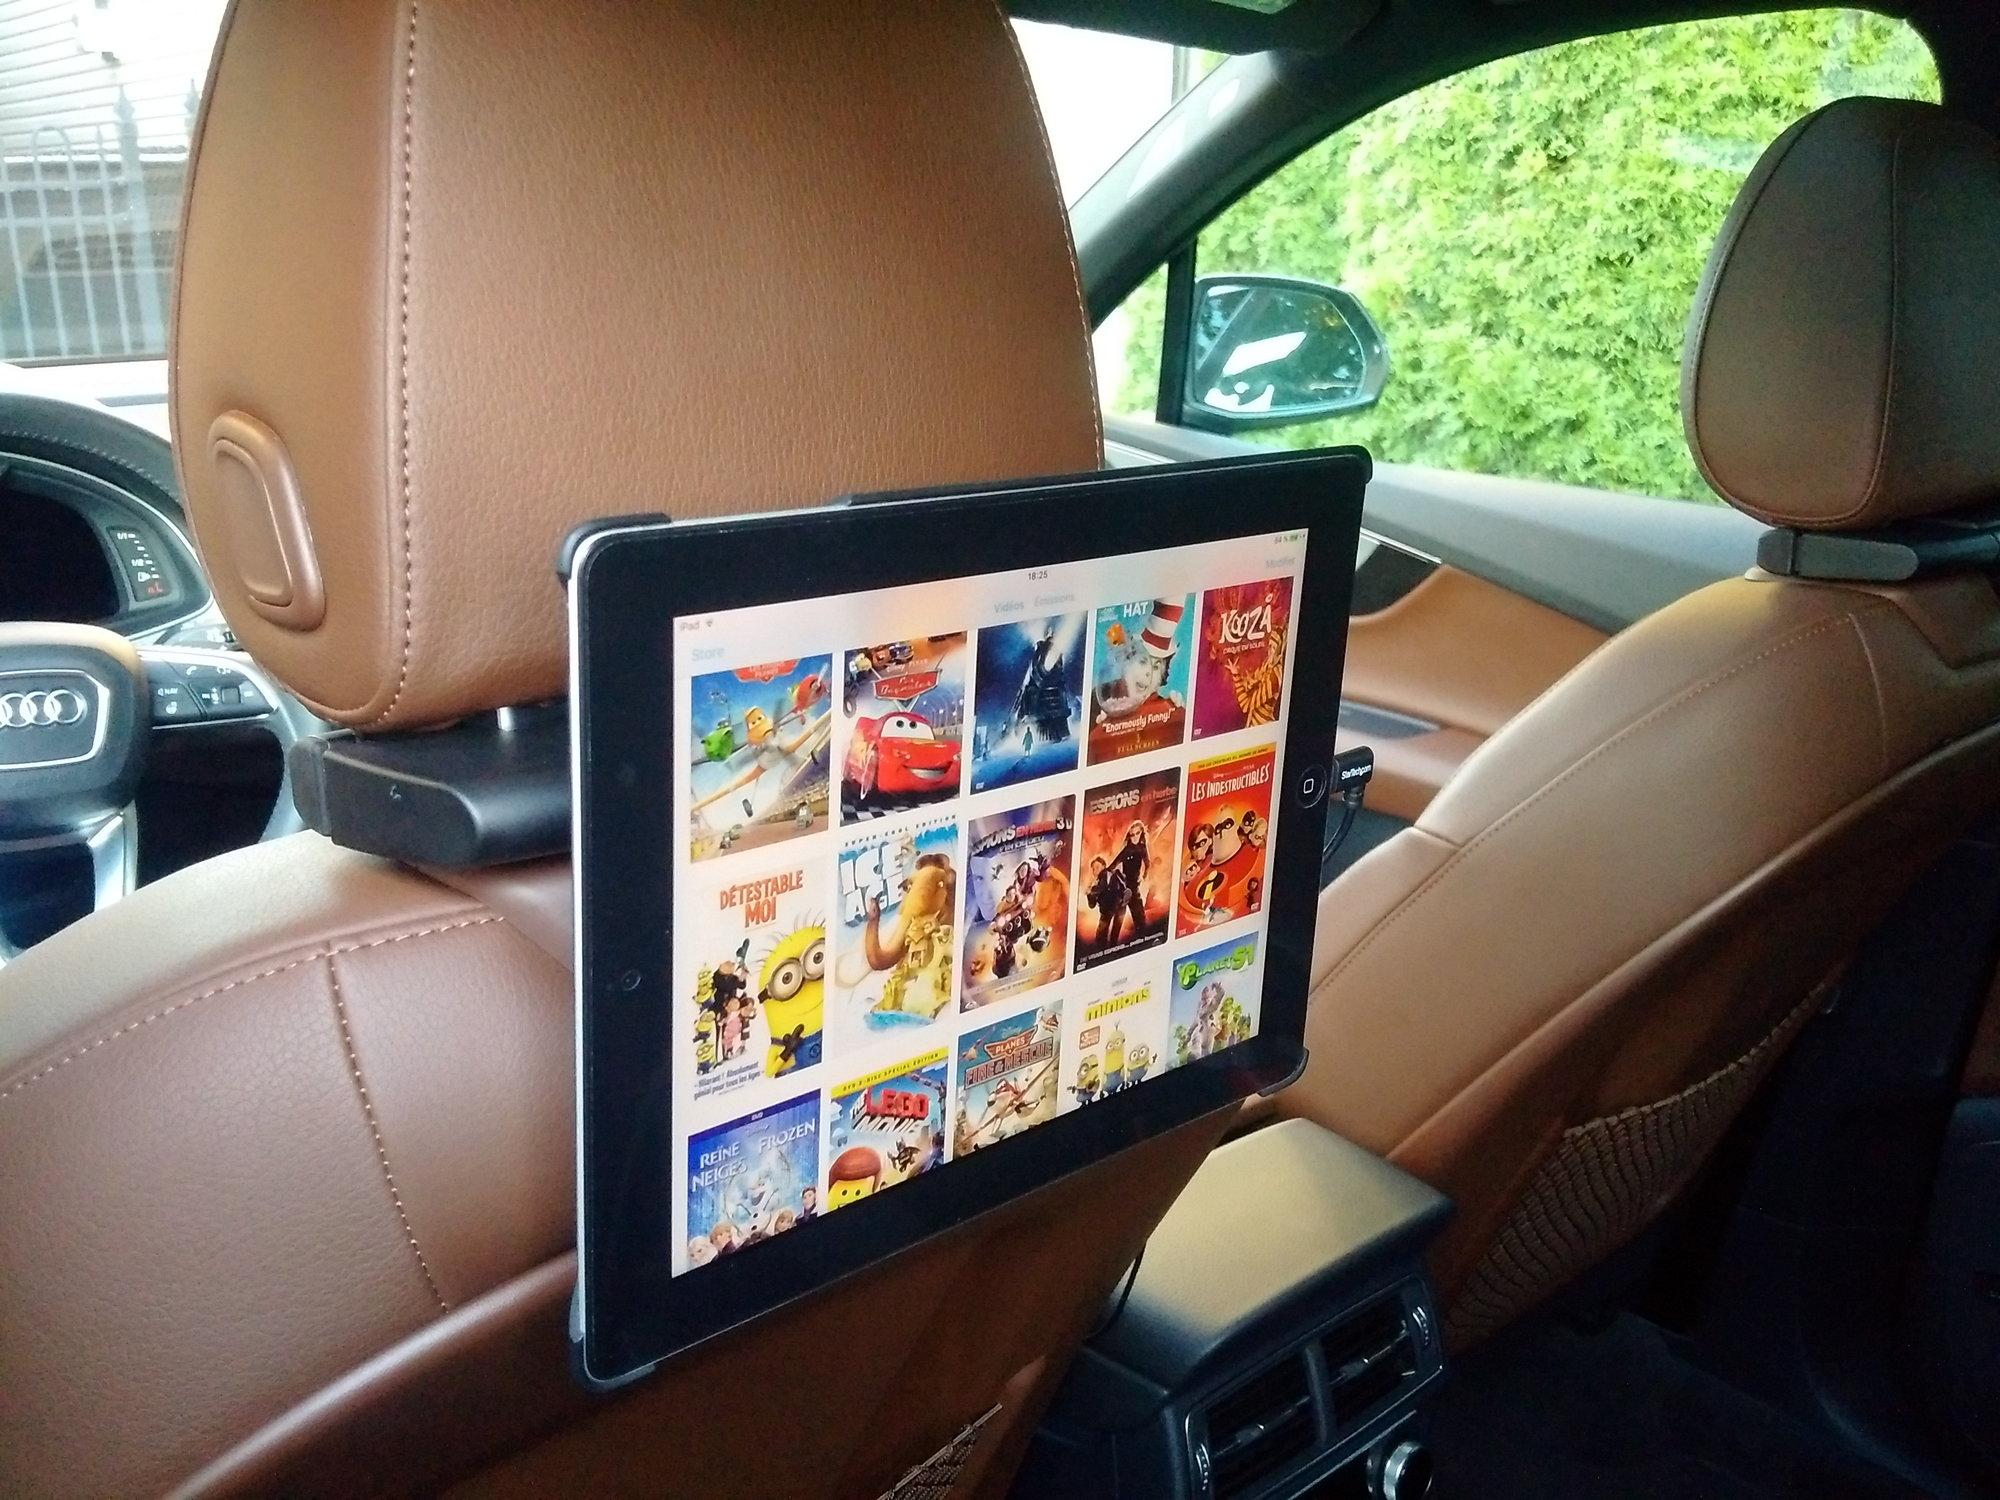 2017 q7 rse review horrible rear seat entertainment system page 13 audiworld forums